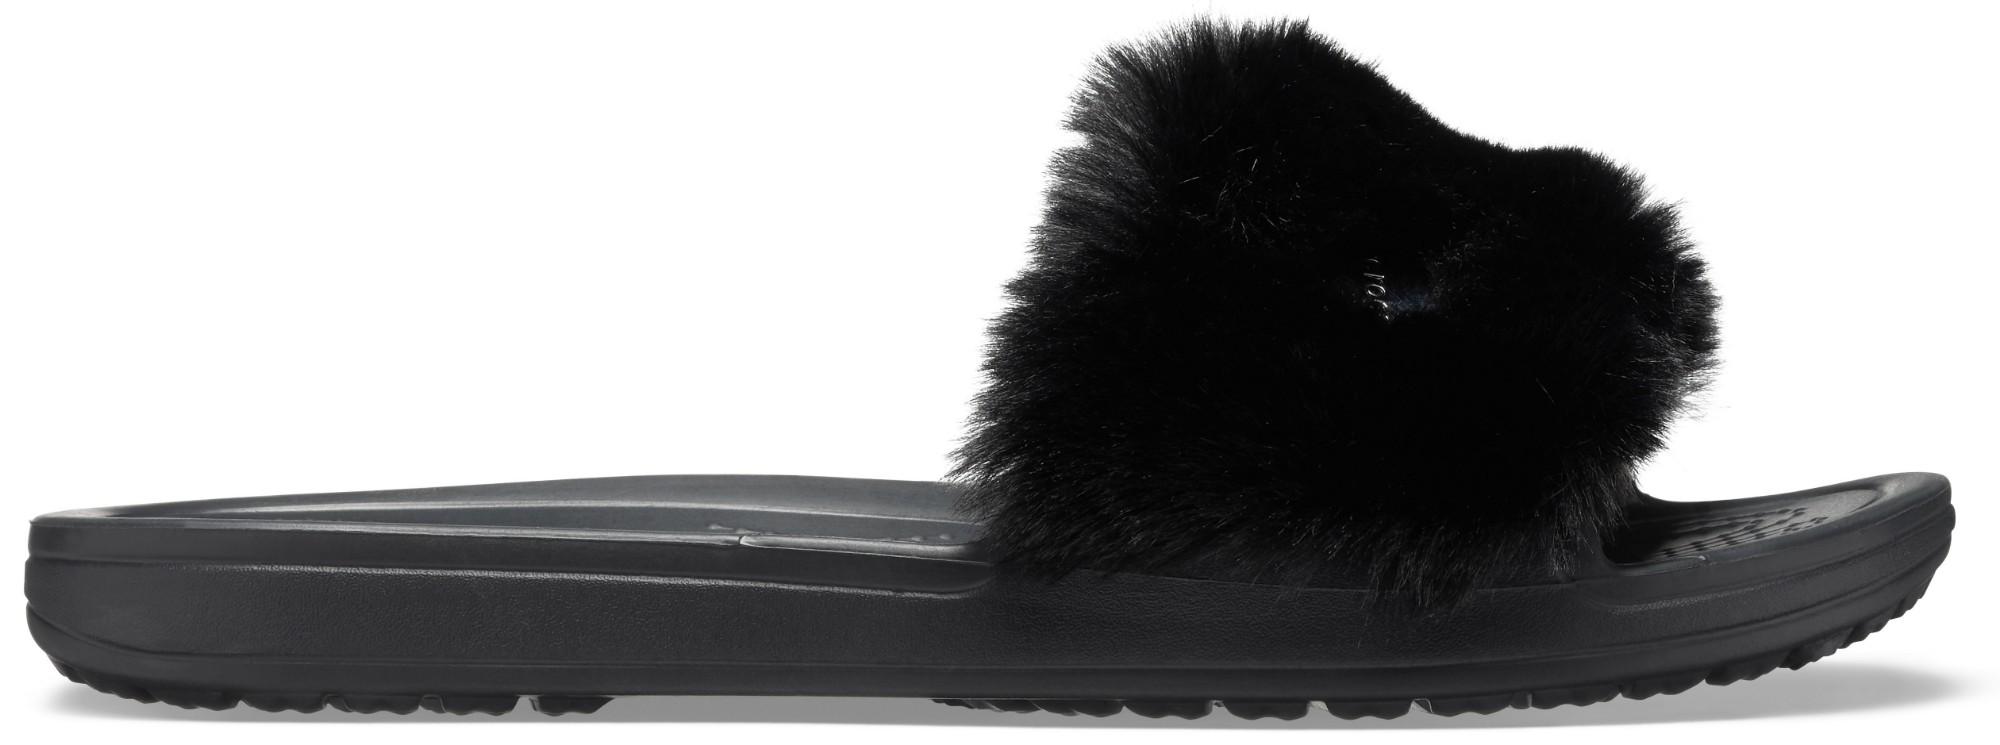 Crocs™ Crocs Sloane Luxe Slide Women's Black/Black 36,5